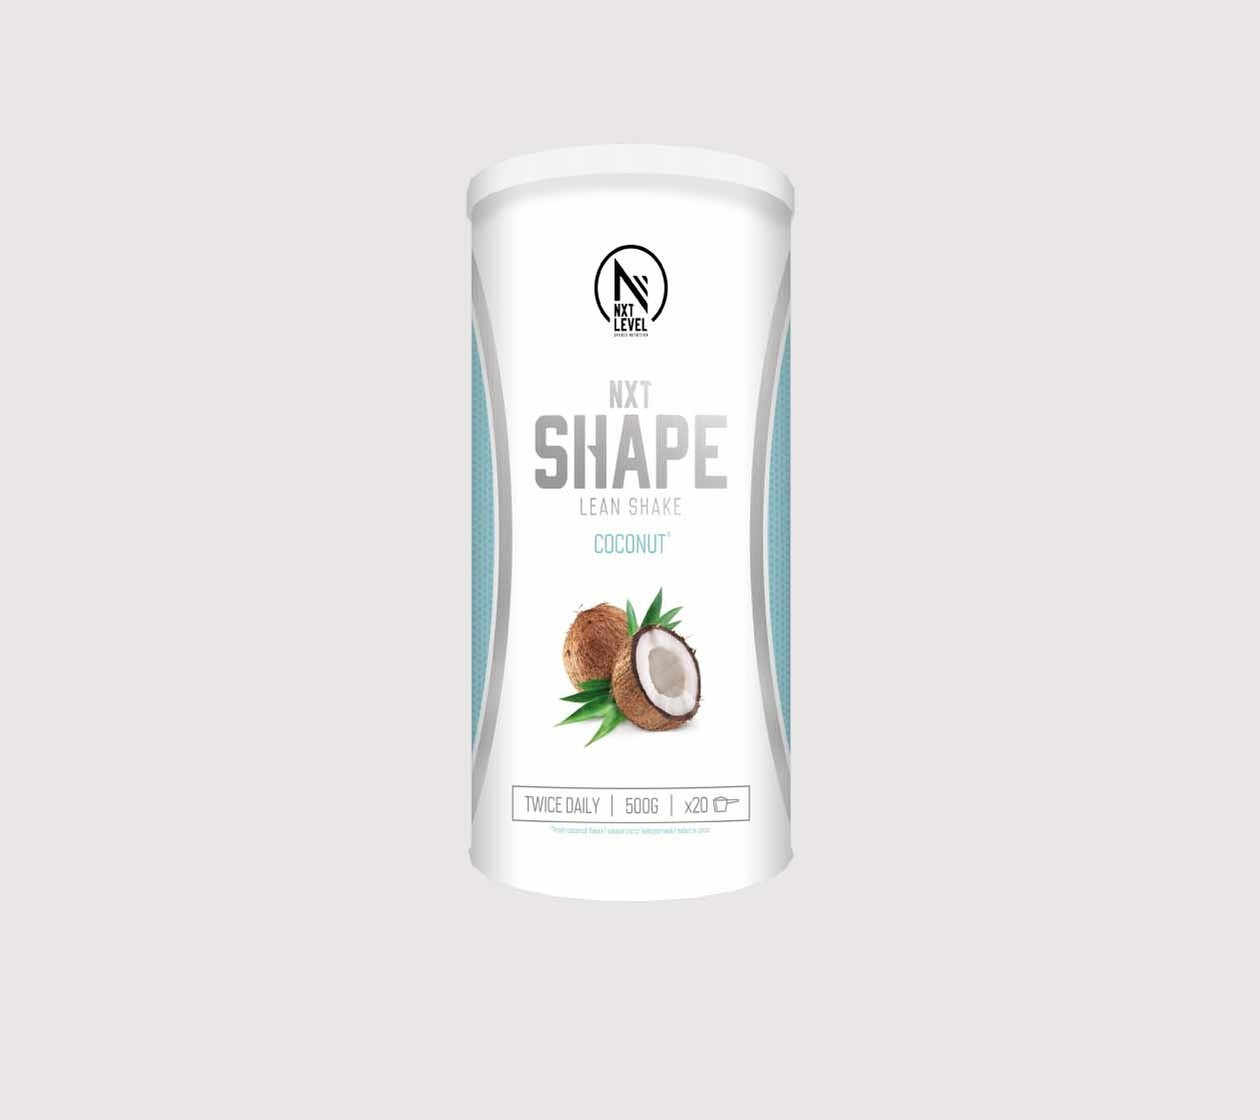 NXT Shape Lean Shake (500g) - Elija entre 3 sabores